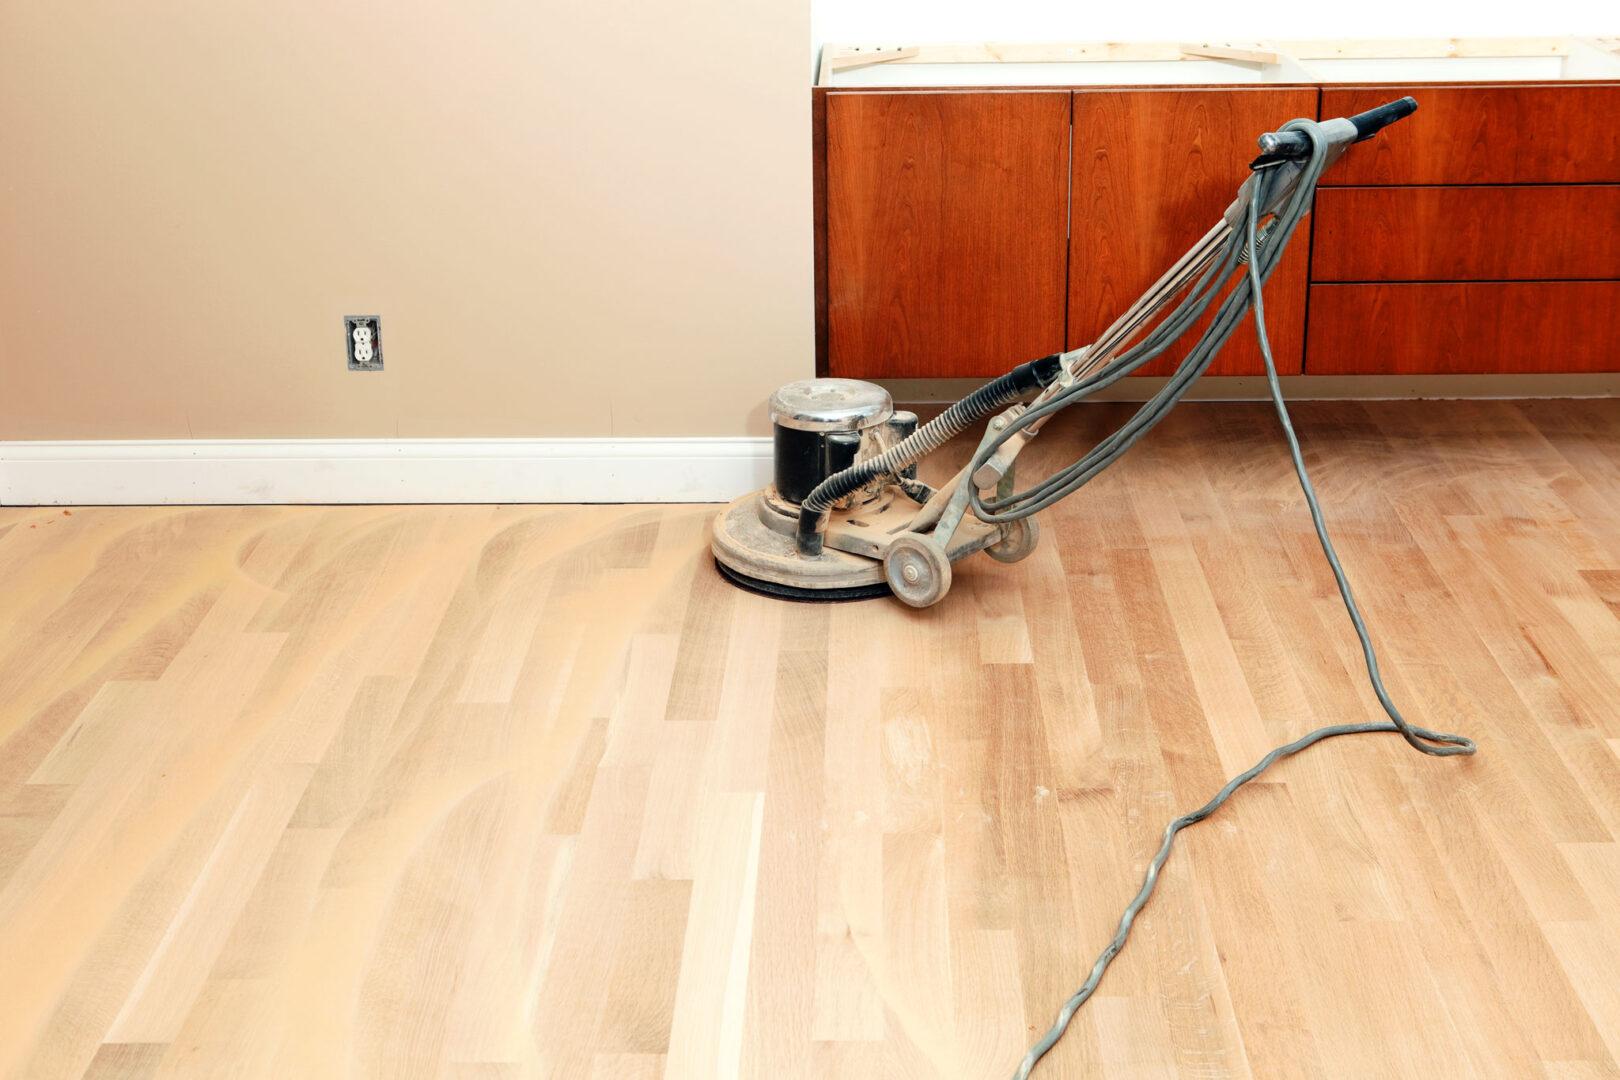 Refinish Your Hardwood Floor